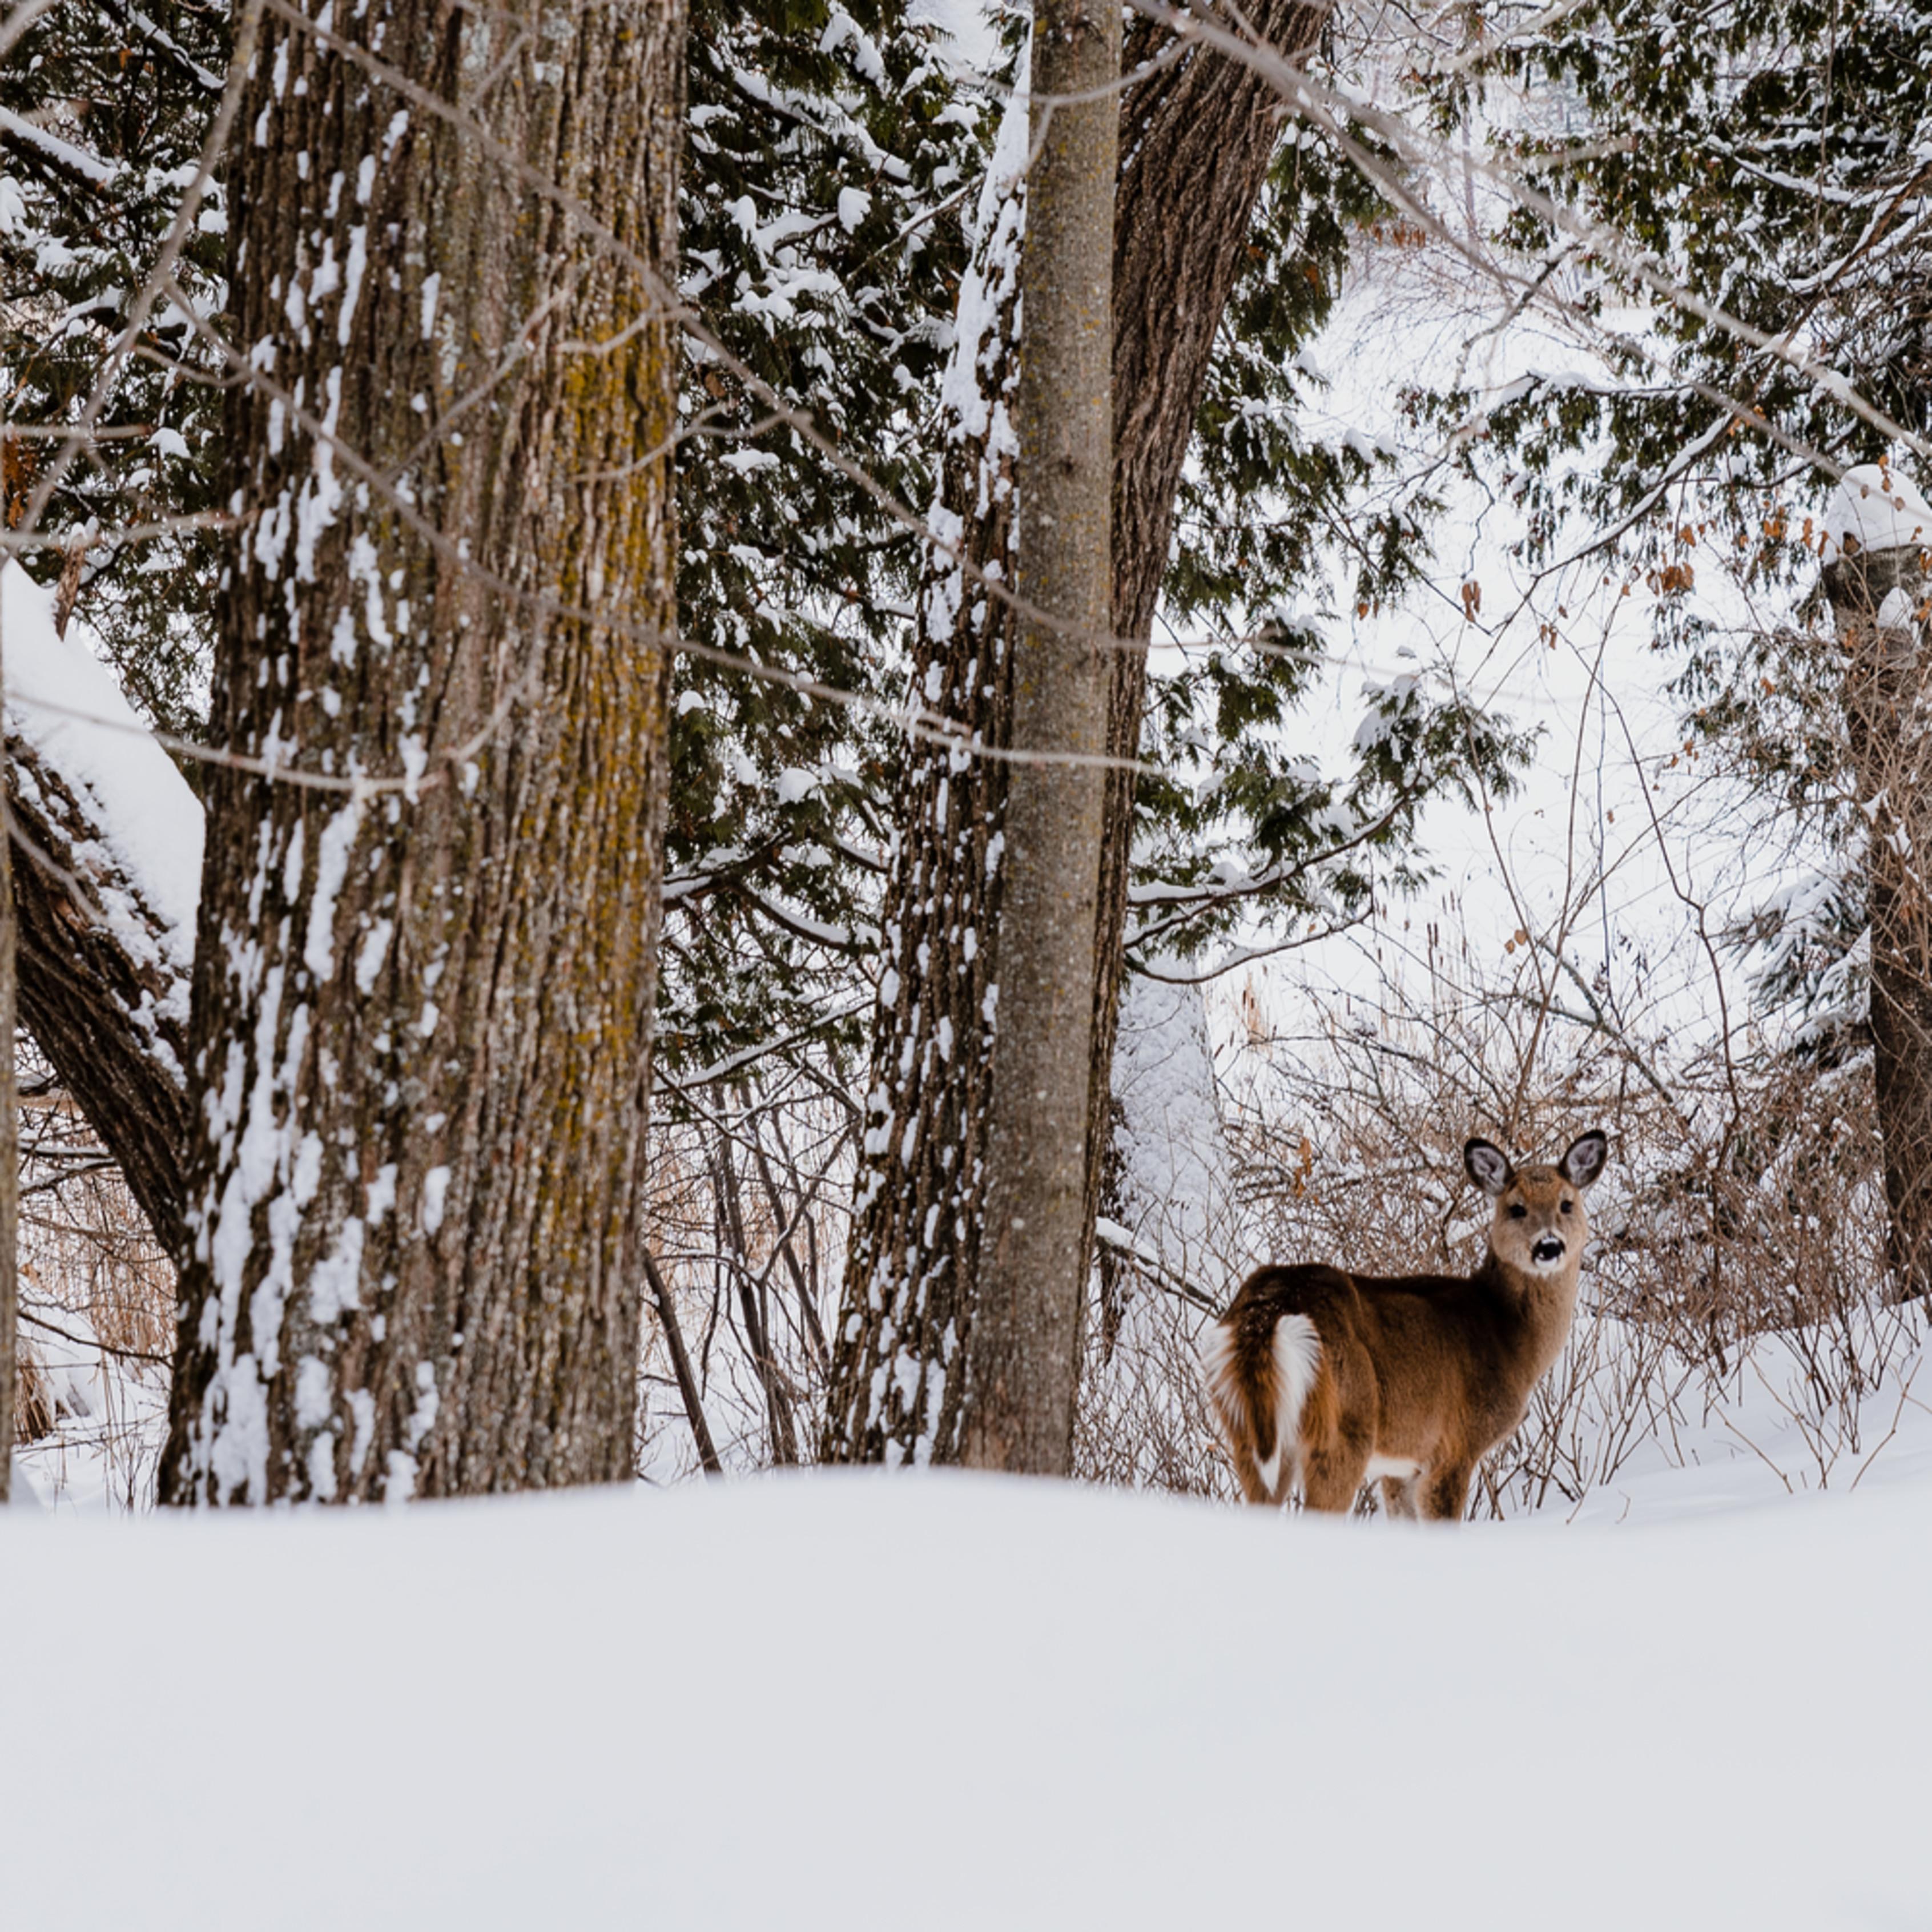 Deer   winter trhlgd